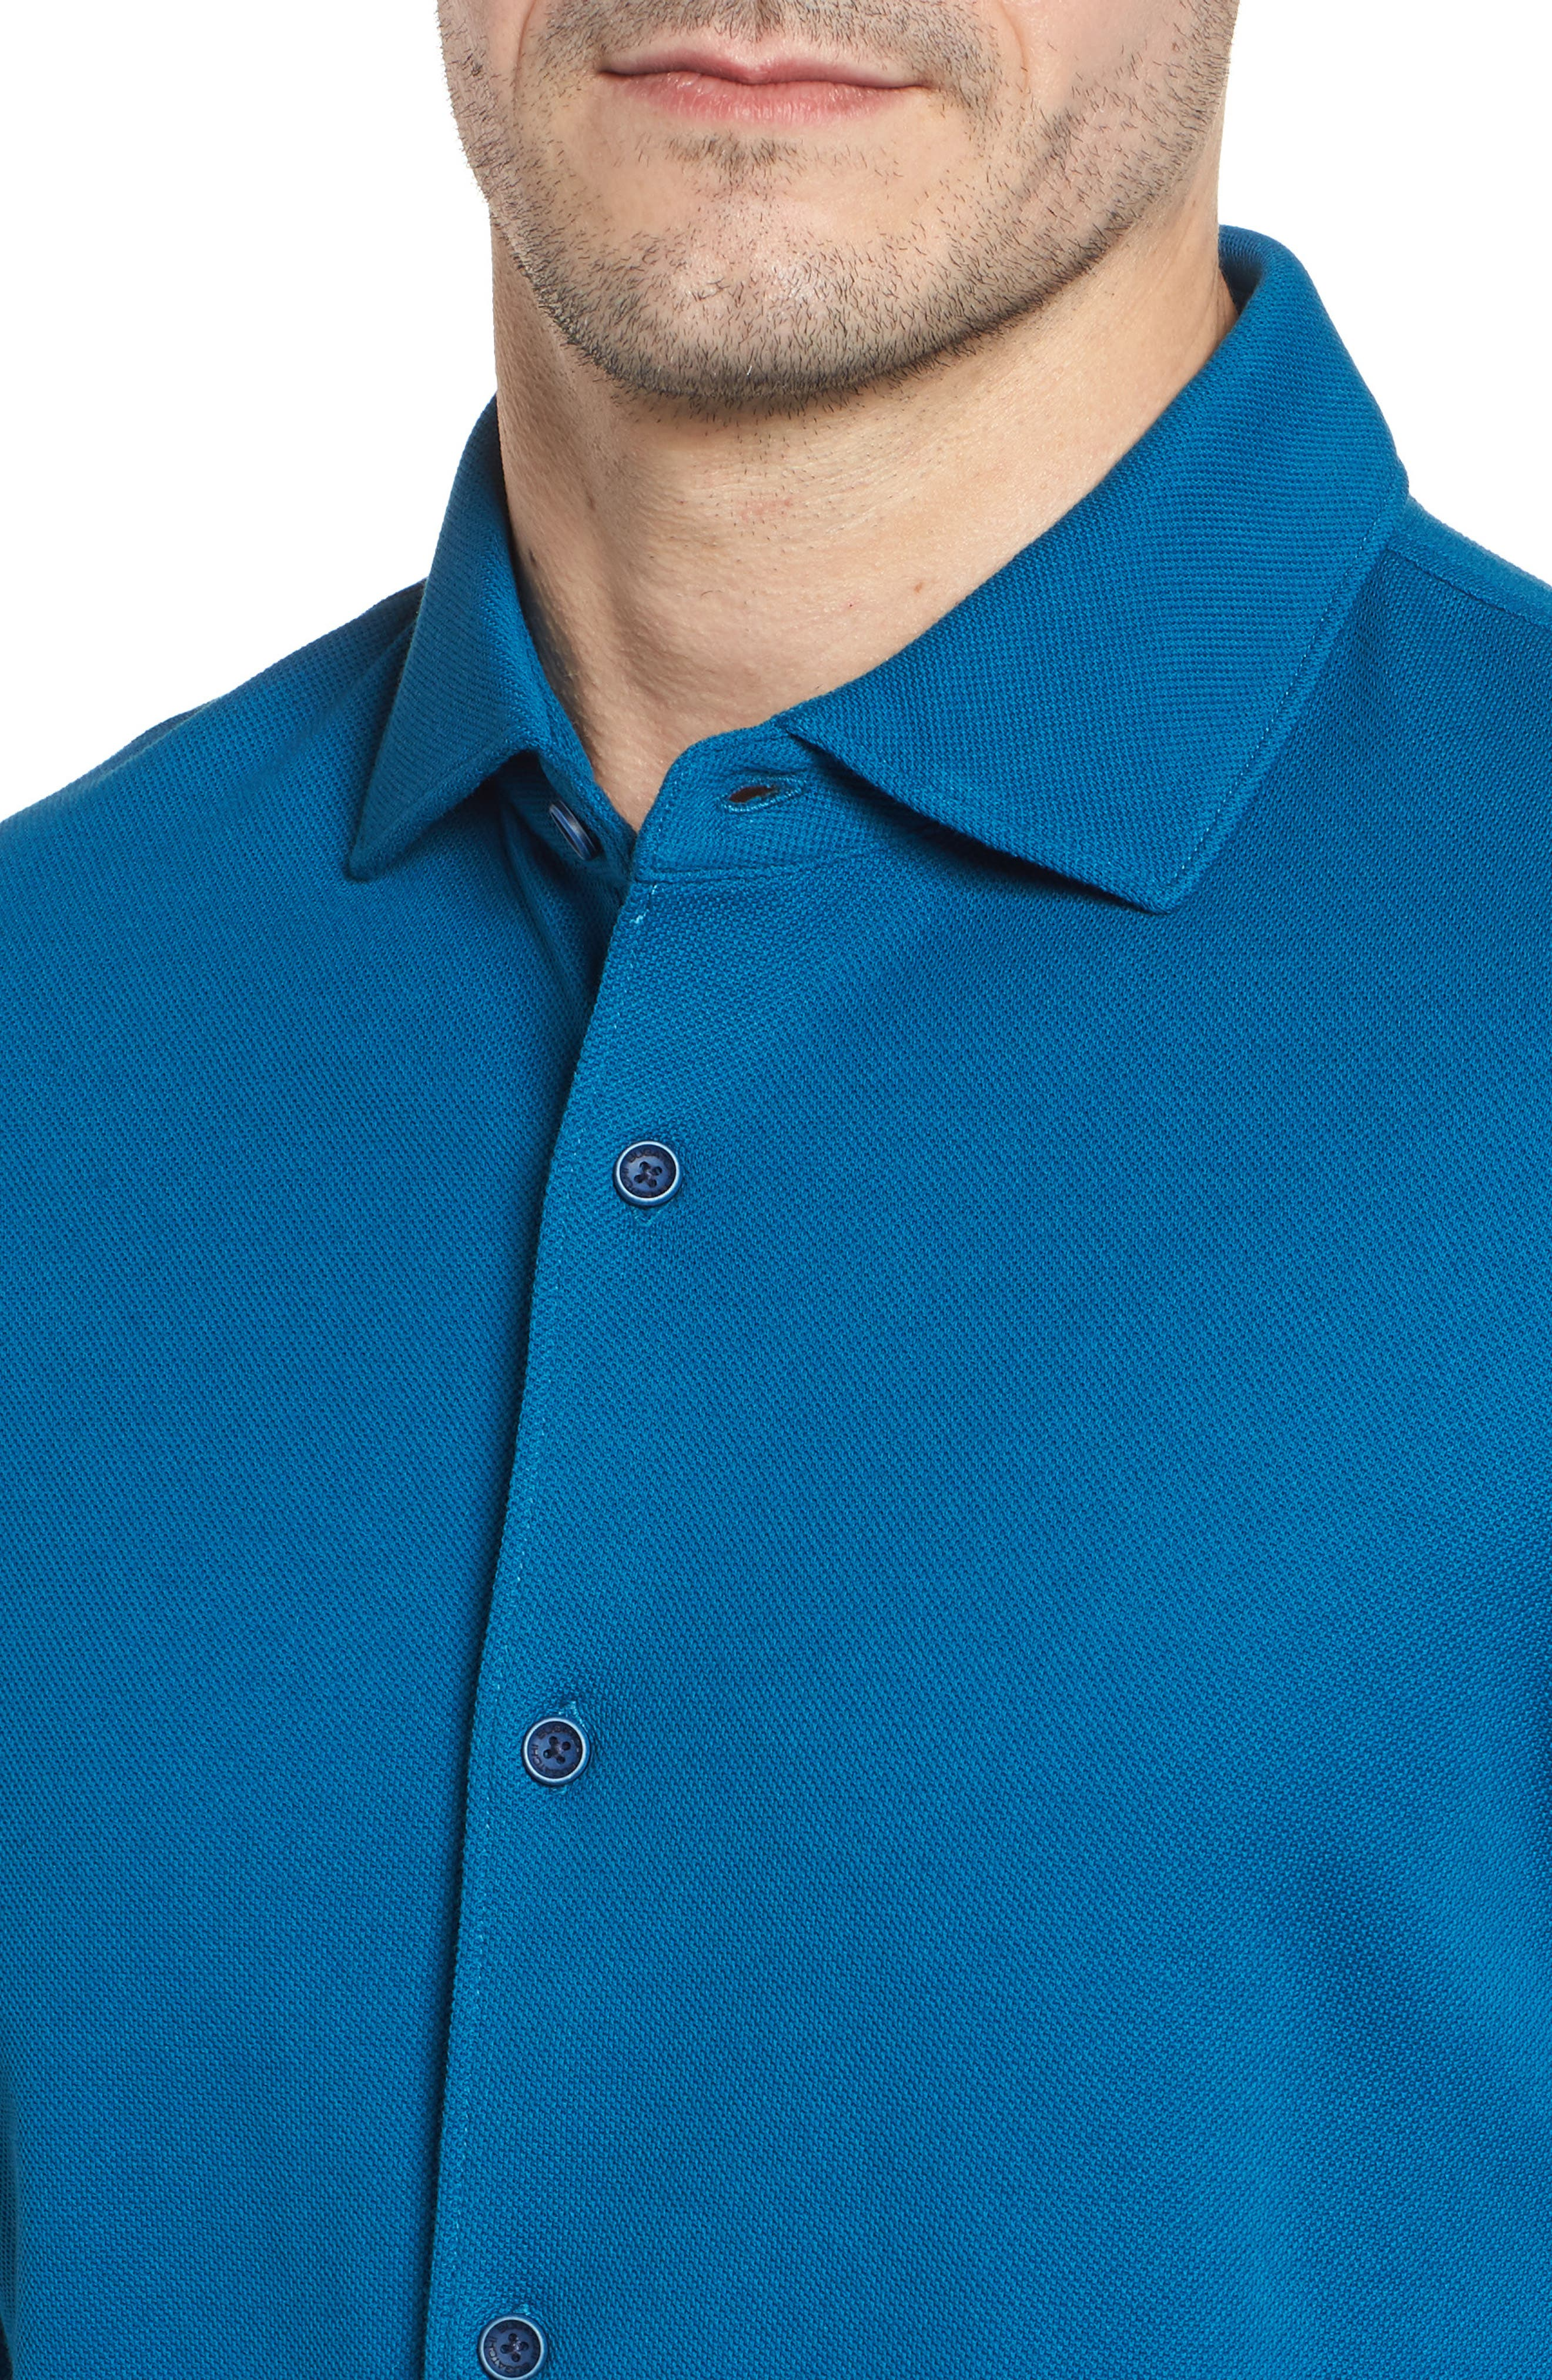 Regular Fit Knit Sport Shirt,                             Alternate thumbnail 4, color,                             445